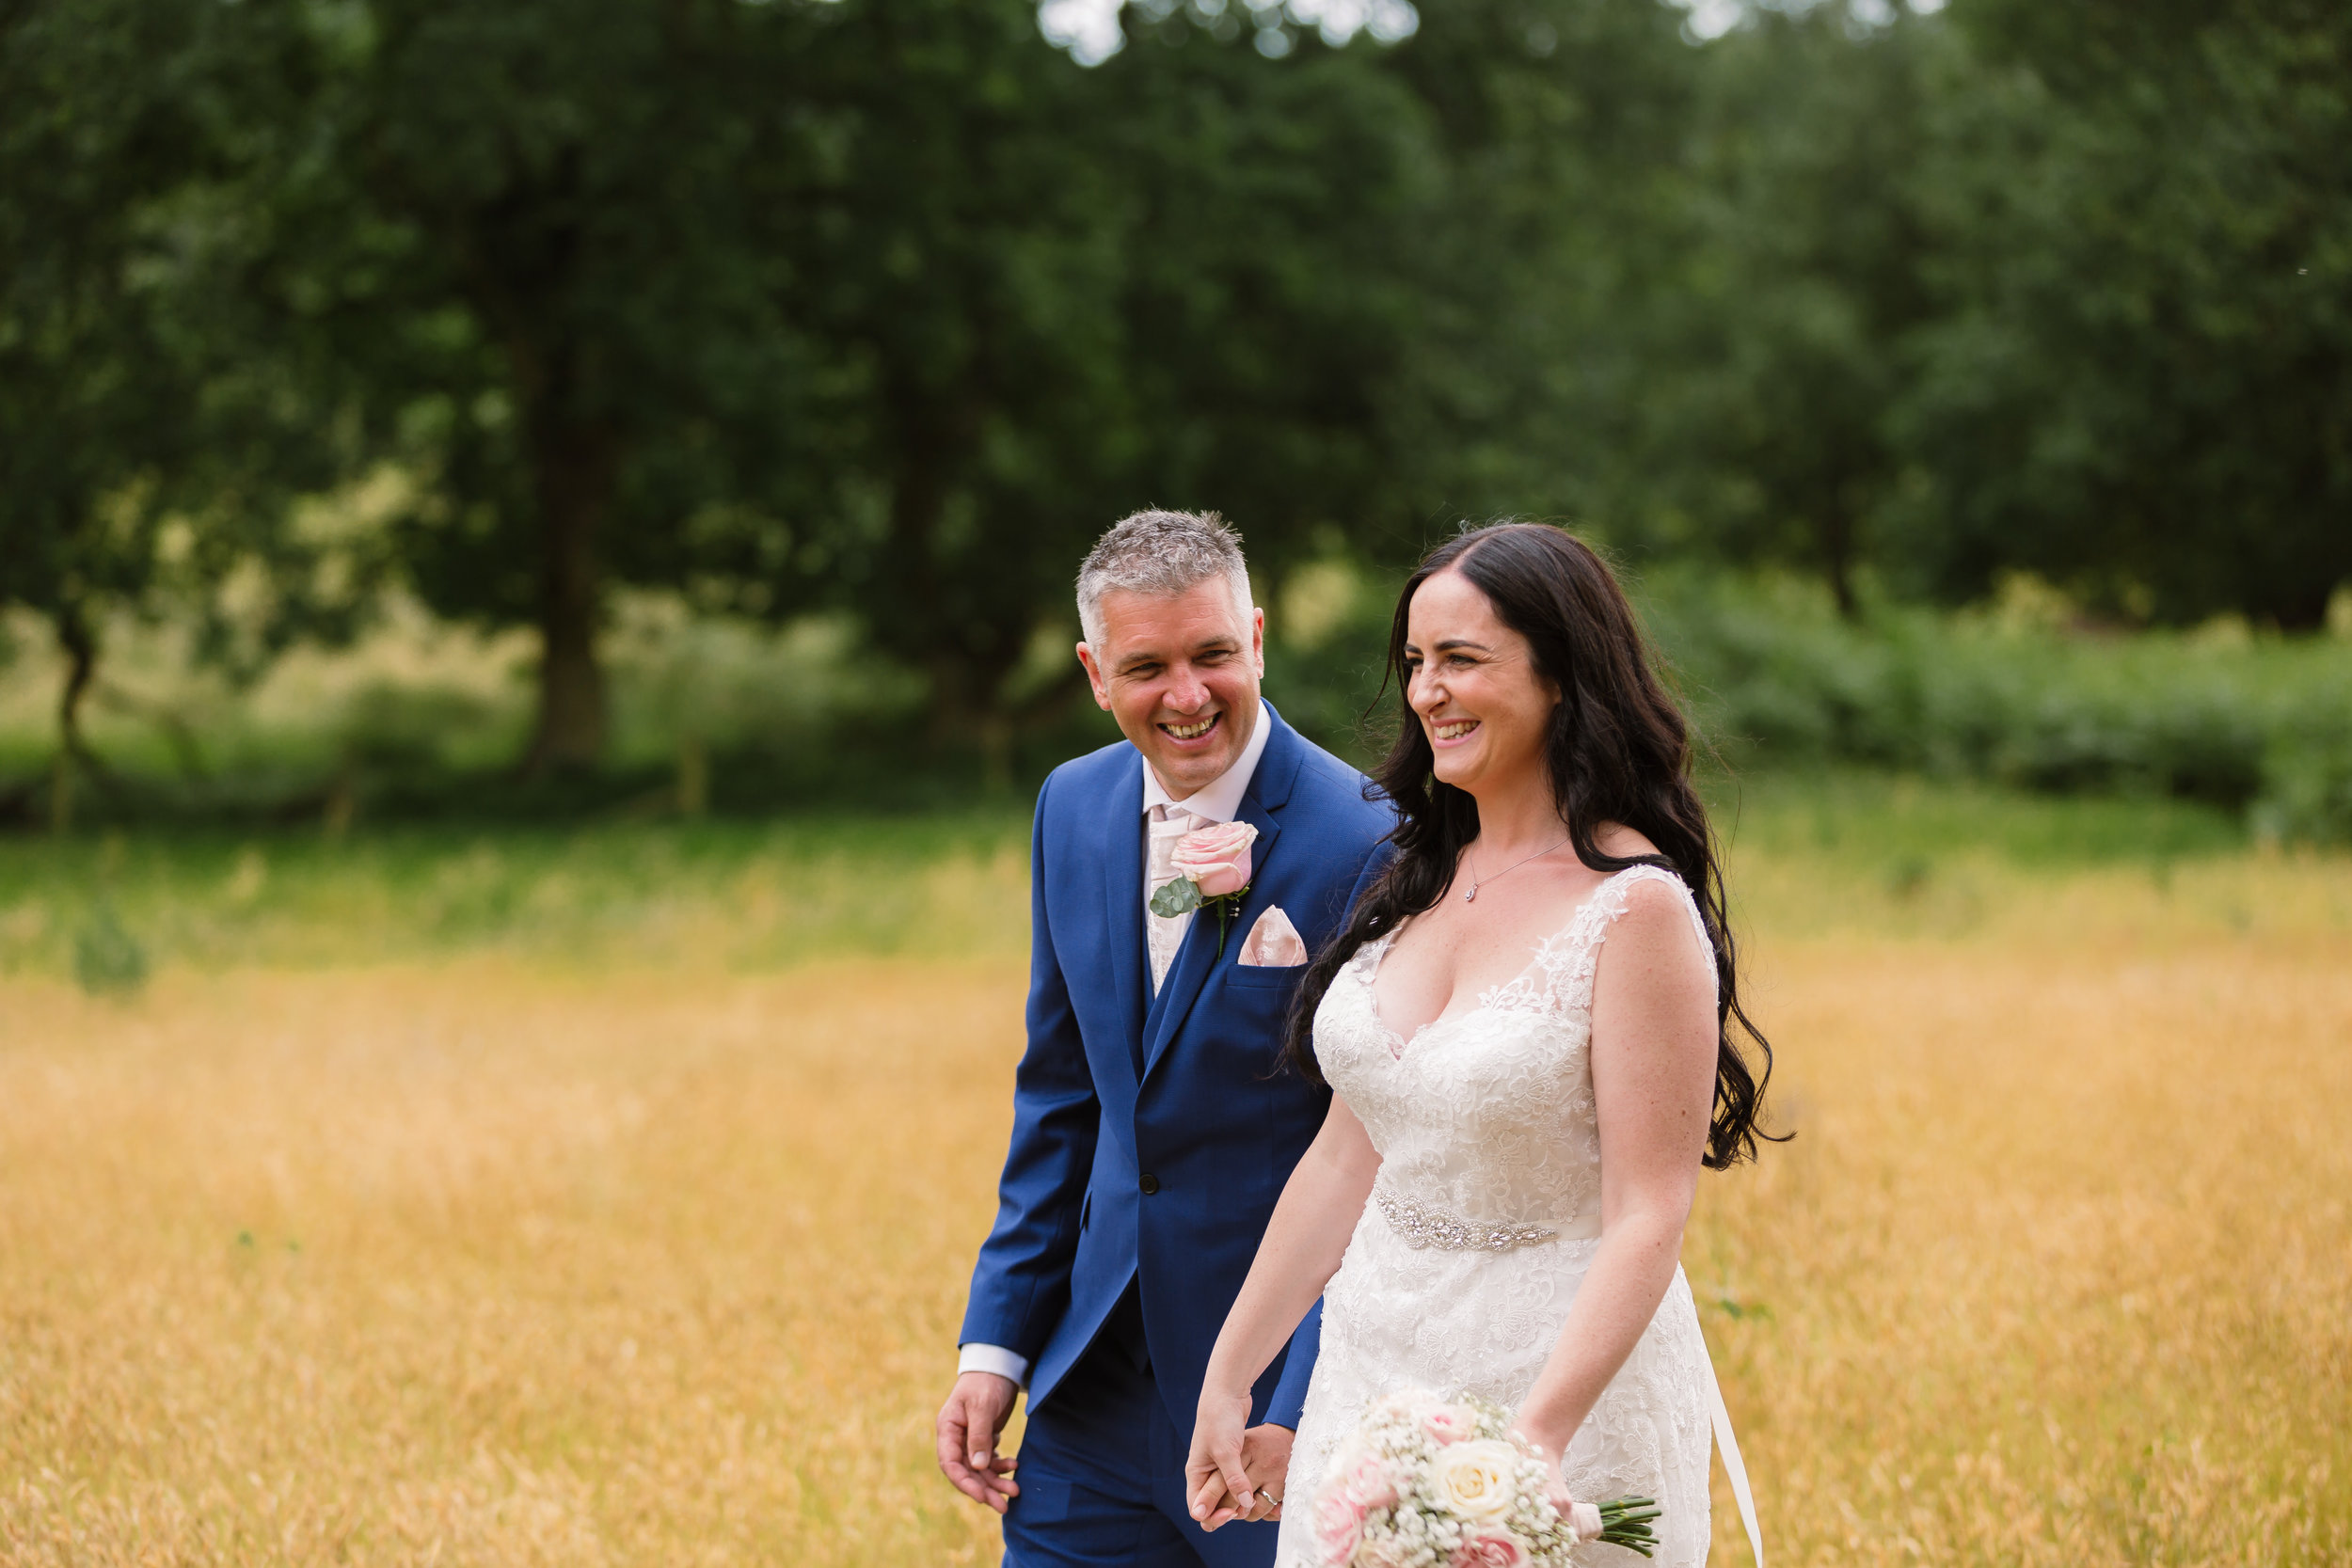 Sarah-Fishlock-Photography : Hampshire-wedding-photographer-hampshire : fleet-wedding-photographer-fleet : Meade-Hall-Wedding-Photographer : Meade-Hall-Wedding-Photos-752.jpg